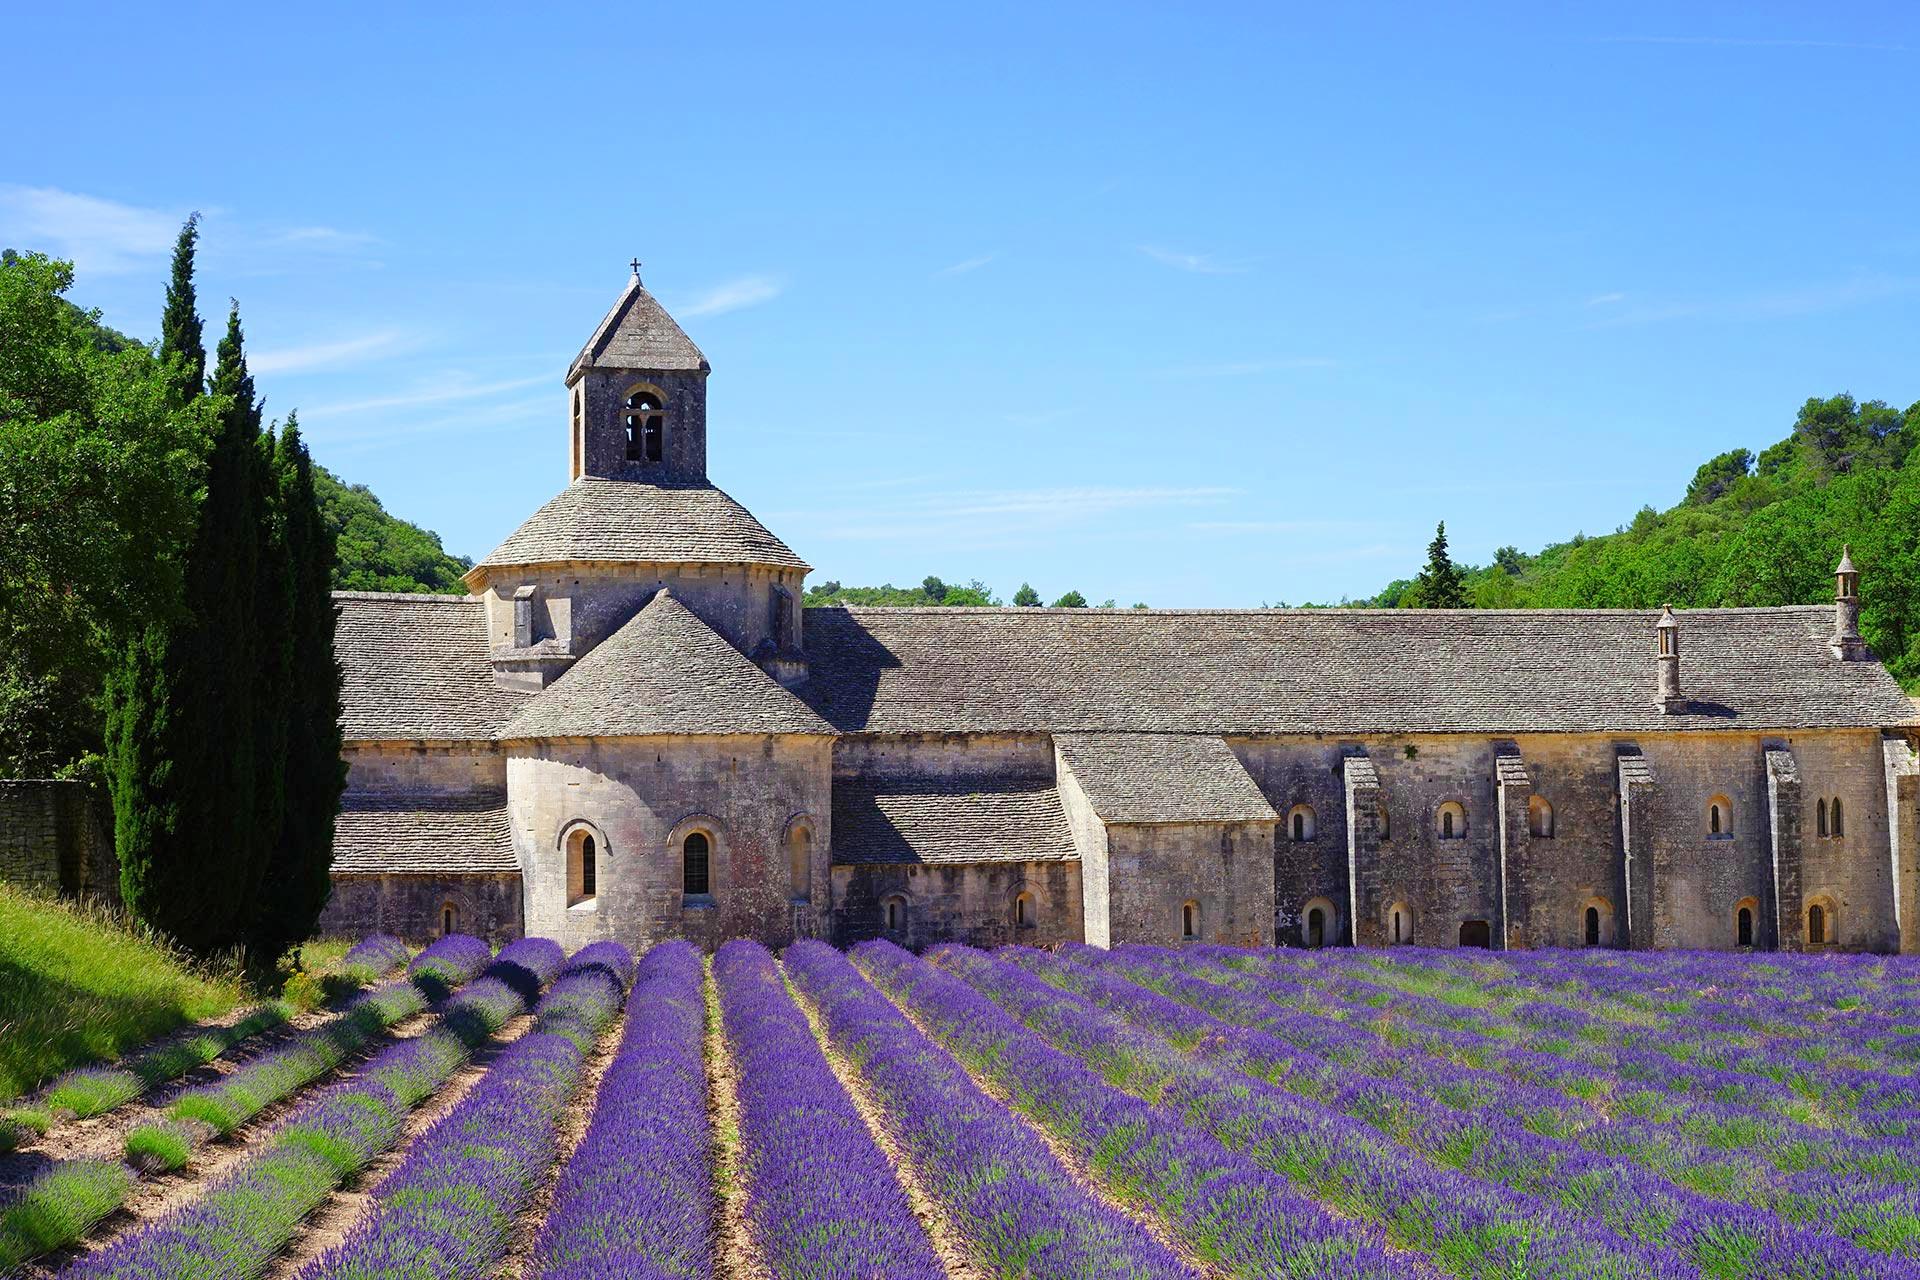 Kloster Senanque im Lavendelfeld